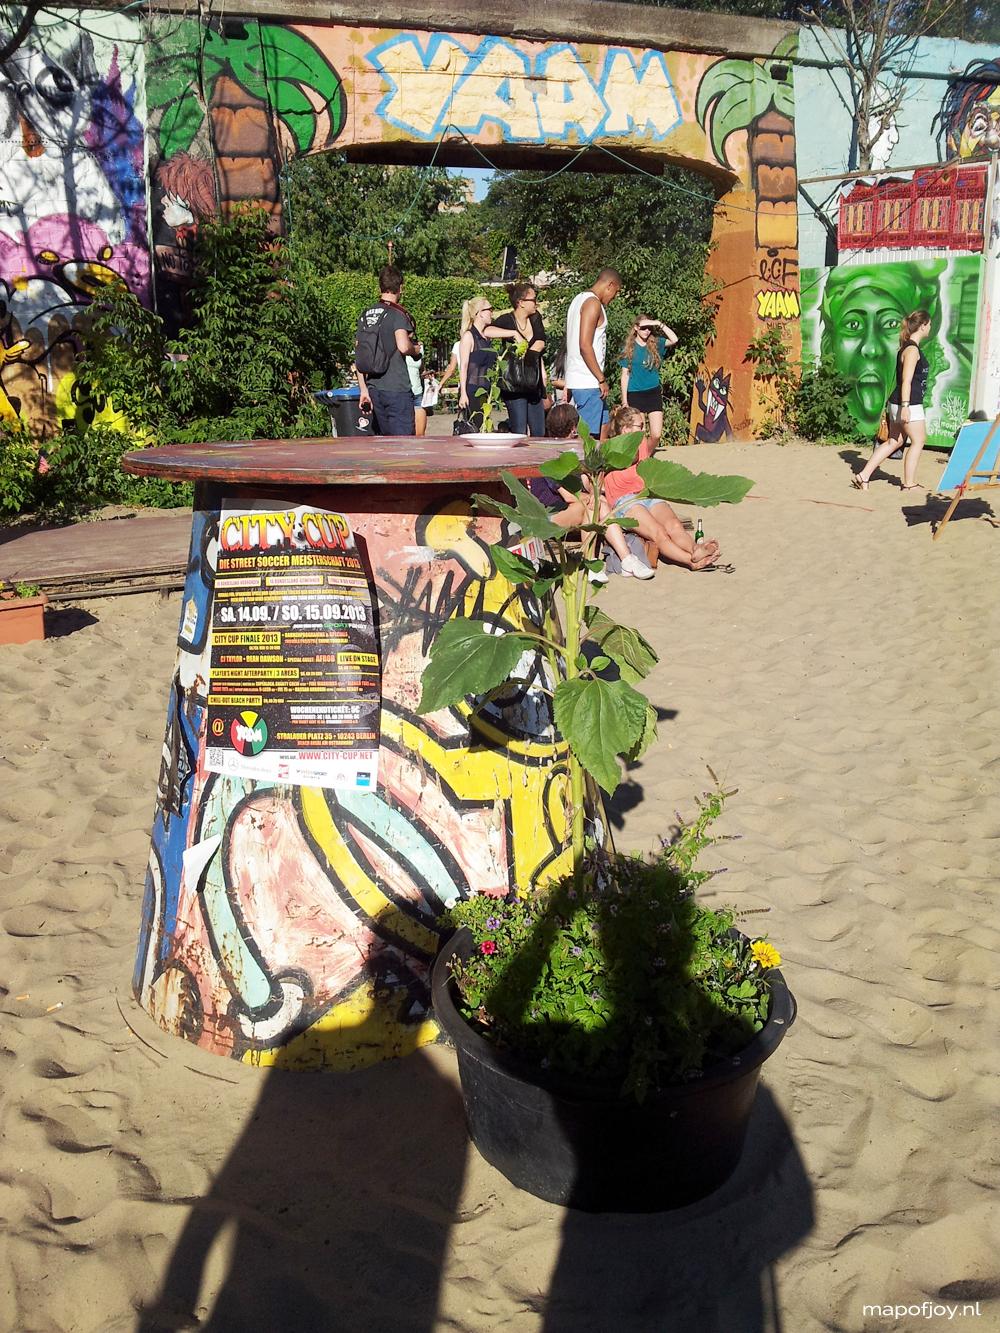 Yaam, Spree, Berlin hotspot - Map of Joy